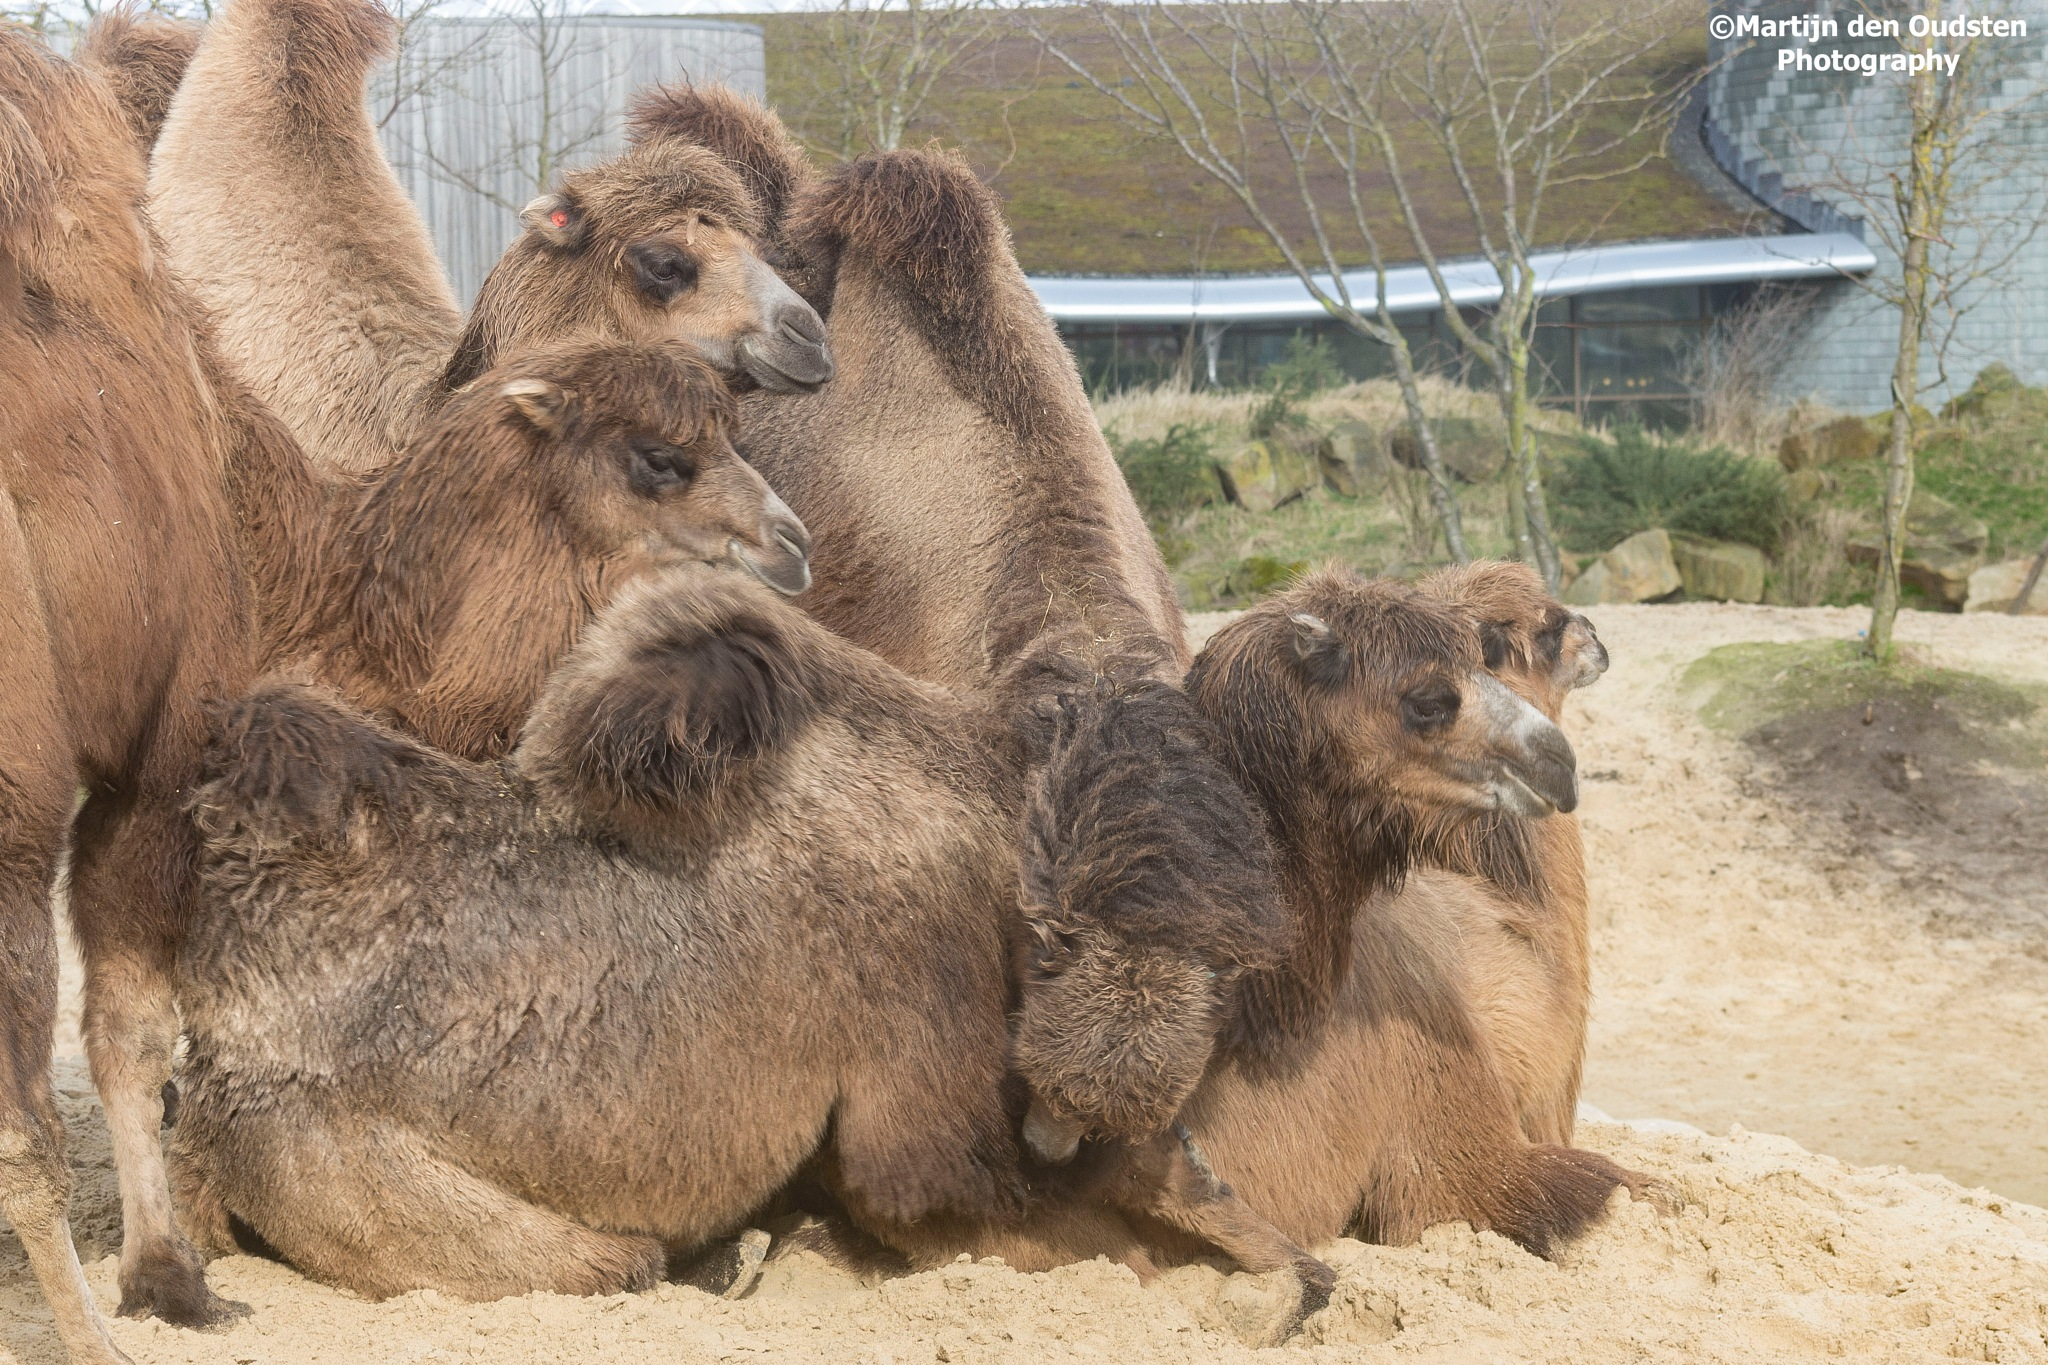 Camels by Martijn Den Oudsten